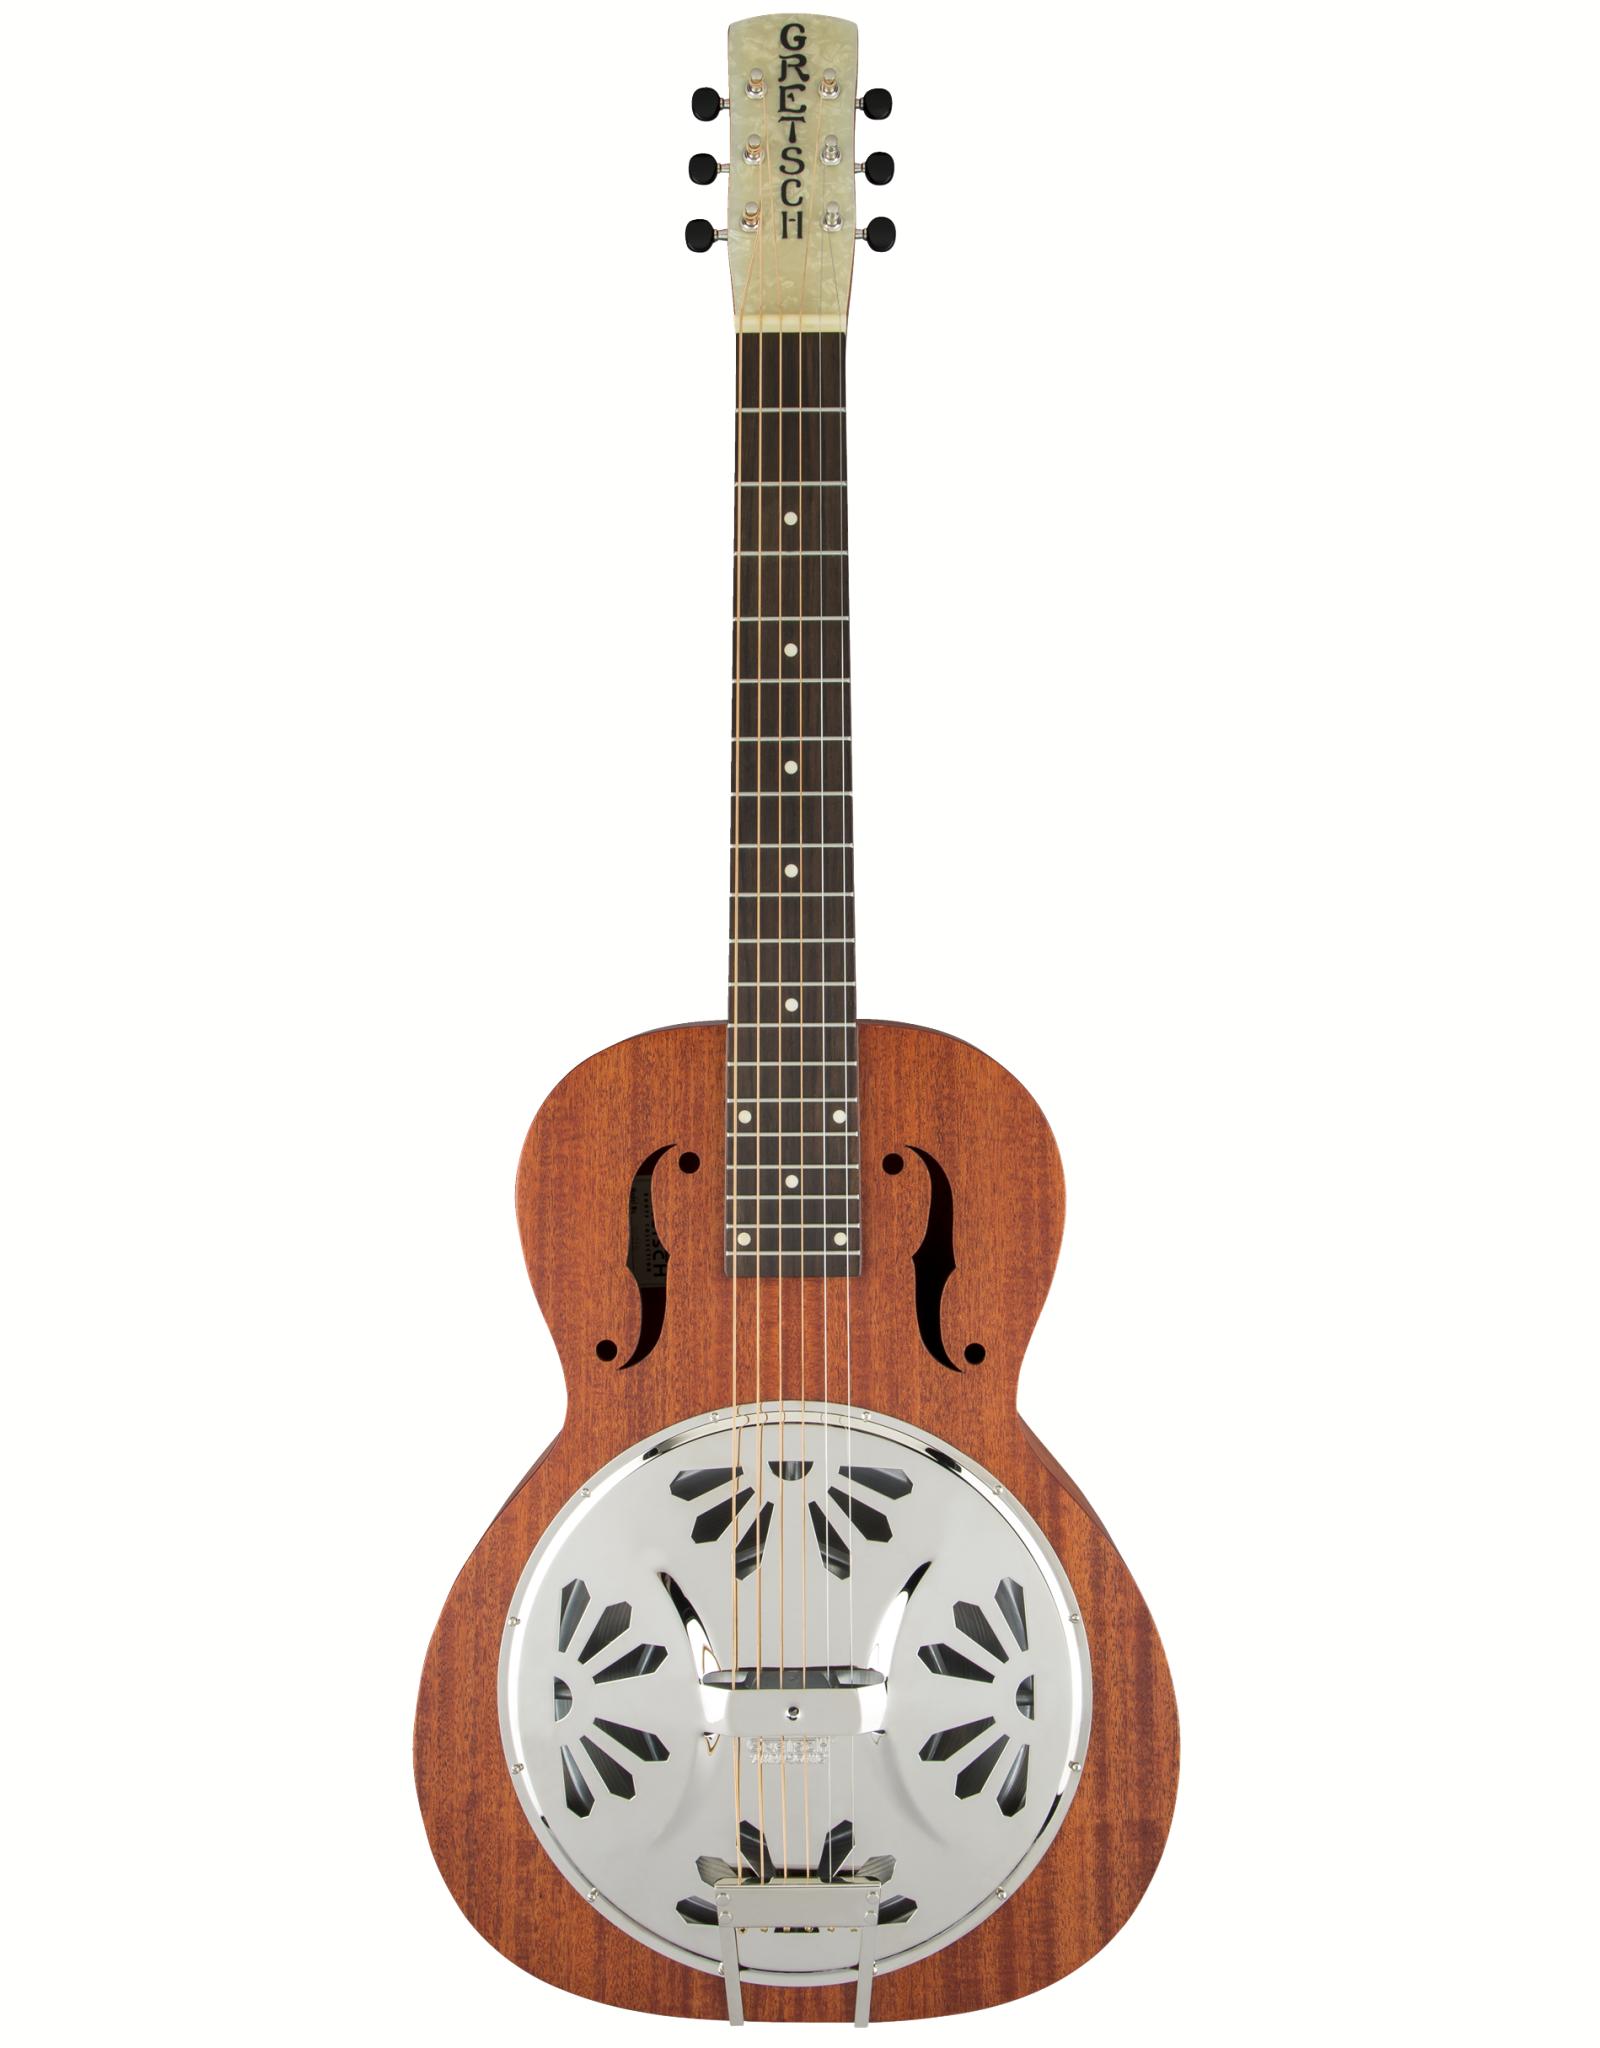 Gretsch Gretsch G9210 Boxcar Square-Neck, Mahogany Body Resonator Guitar, Natural